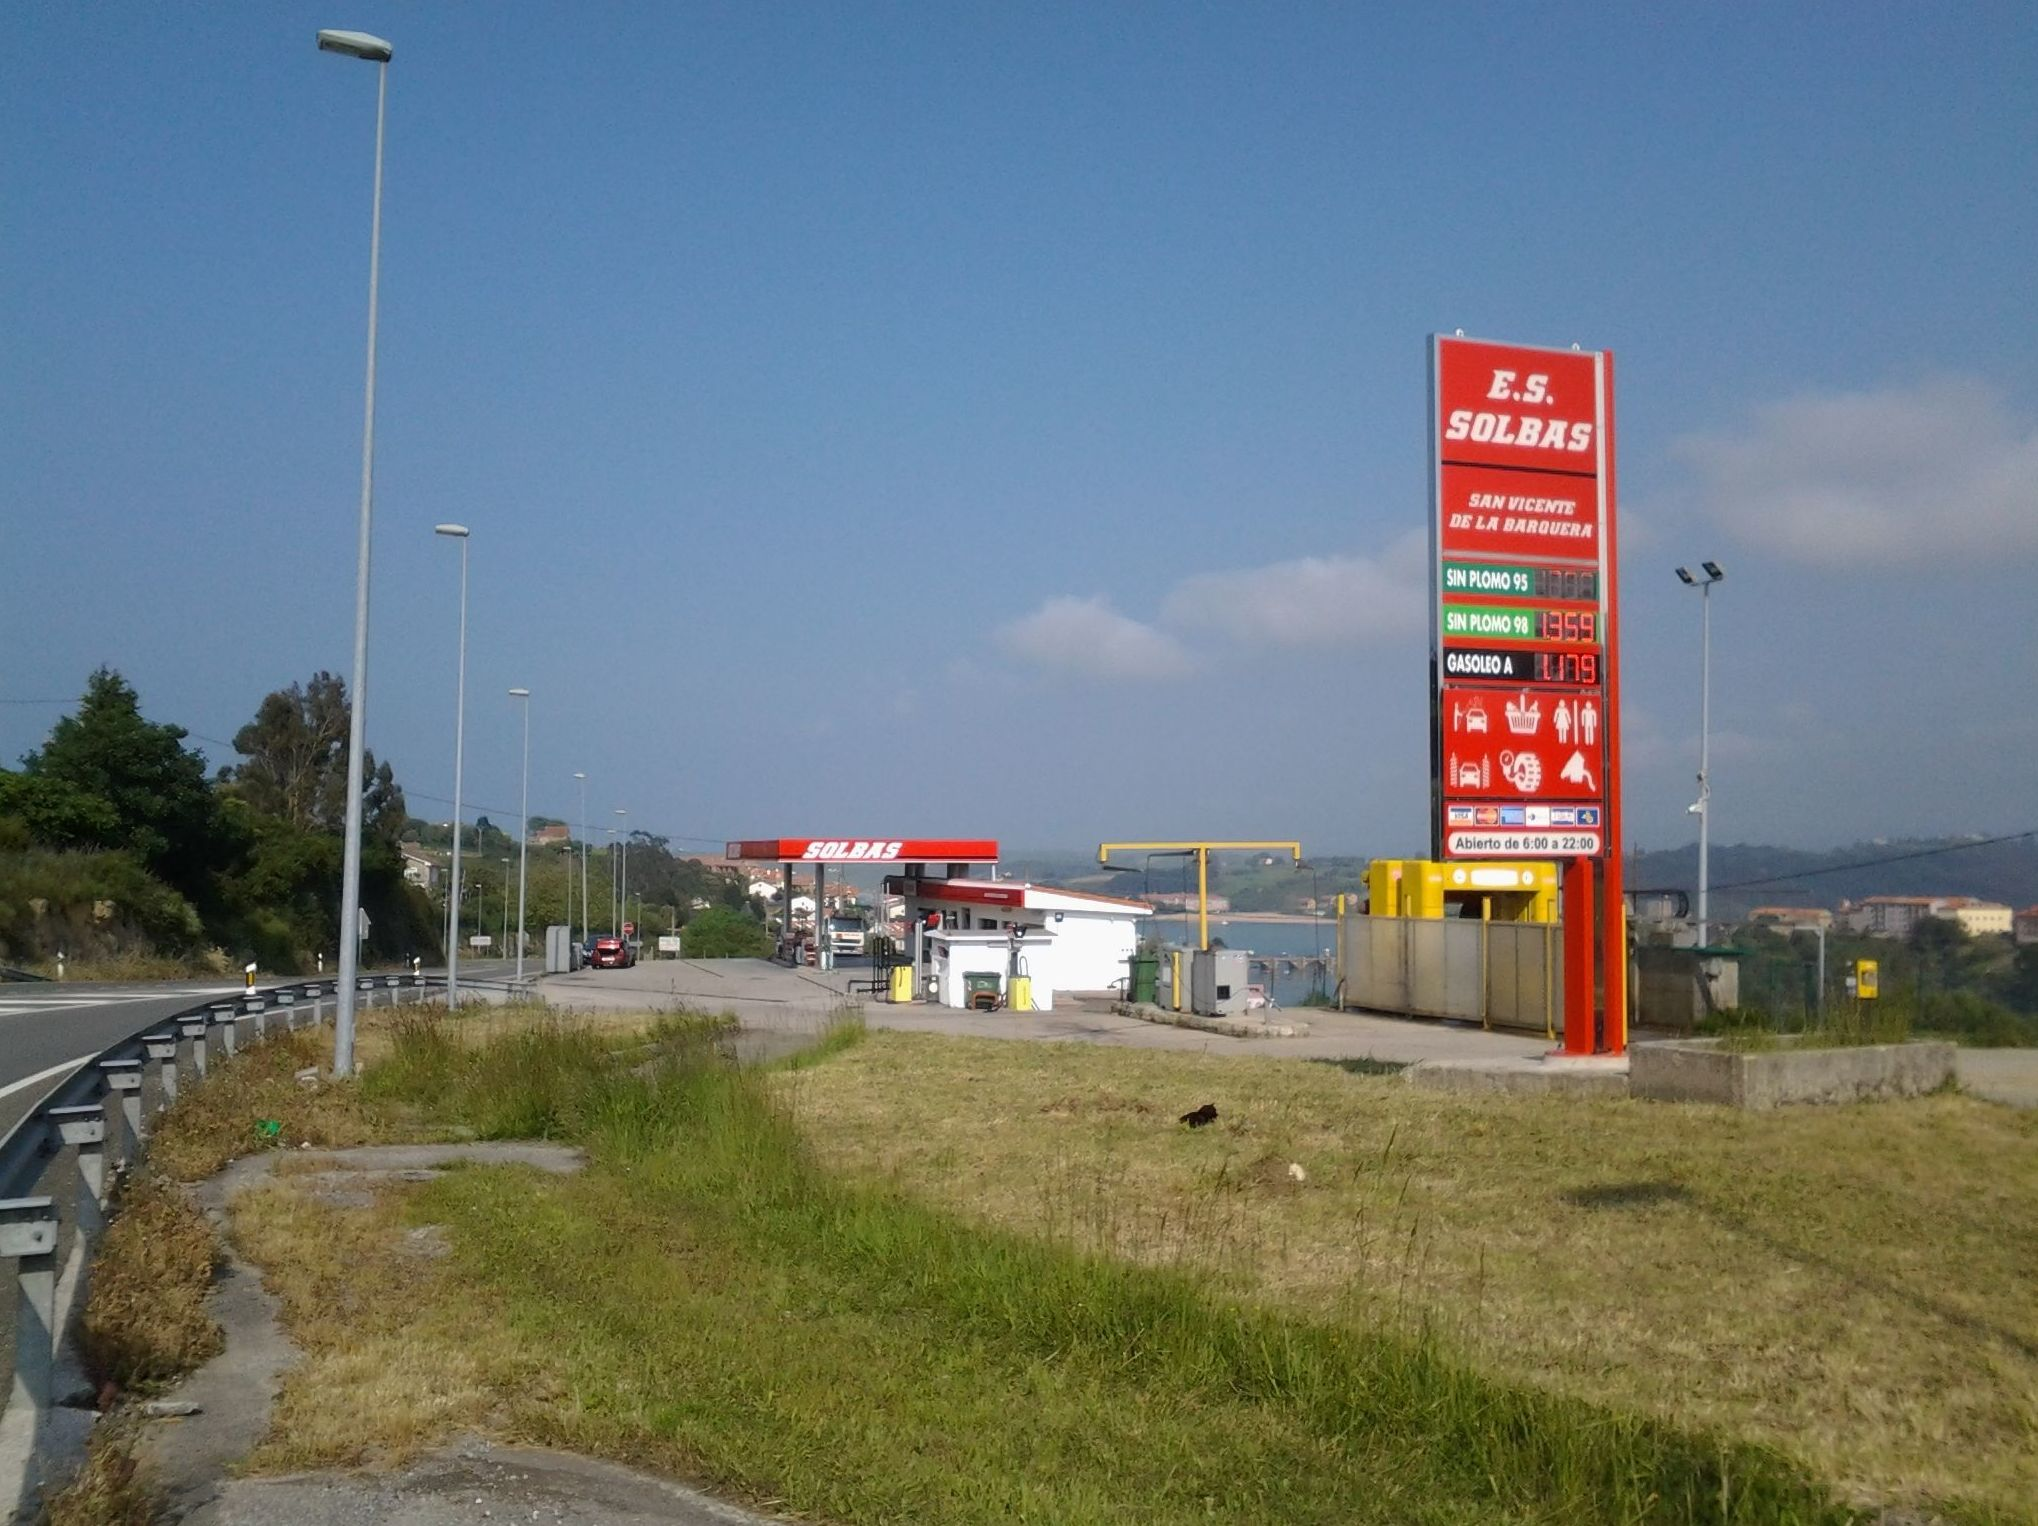 Gasolinera . San Vicente de la Barquera Cantabria